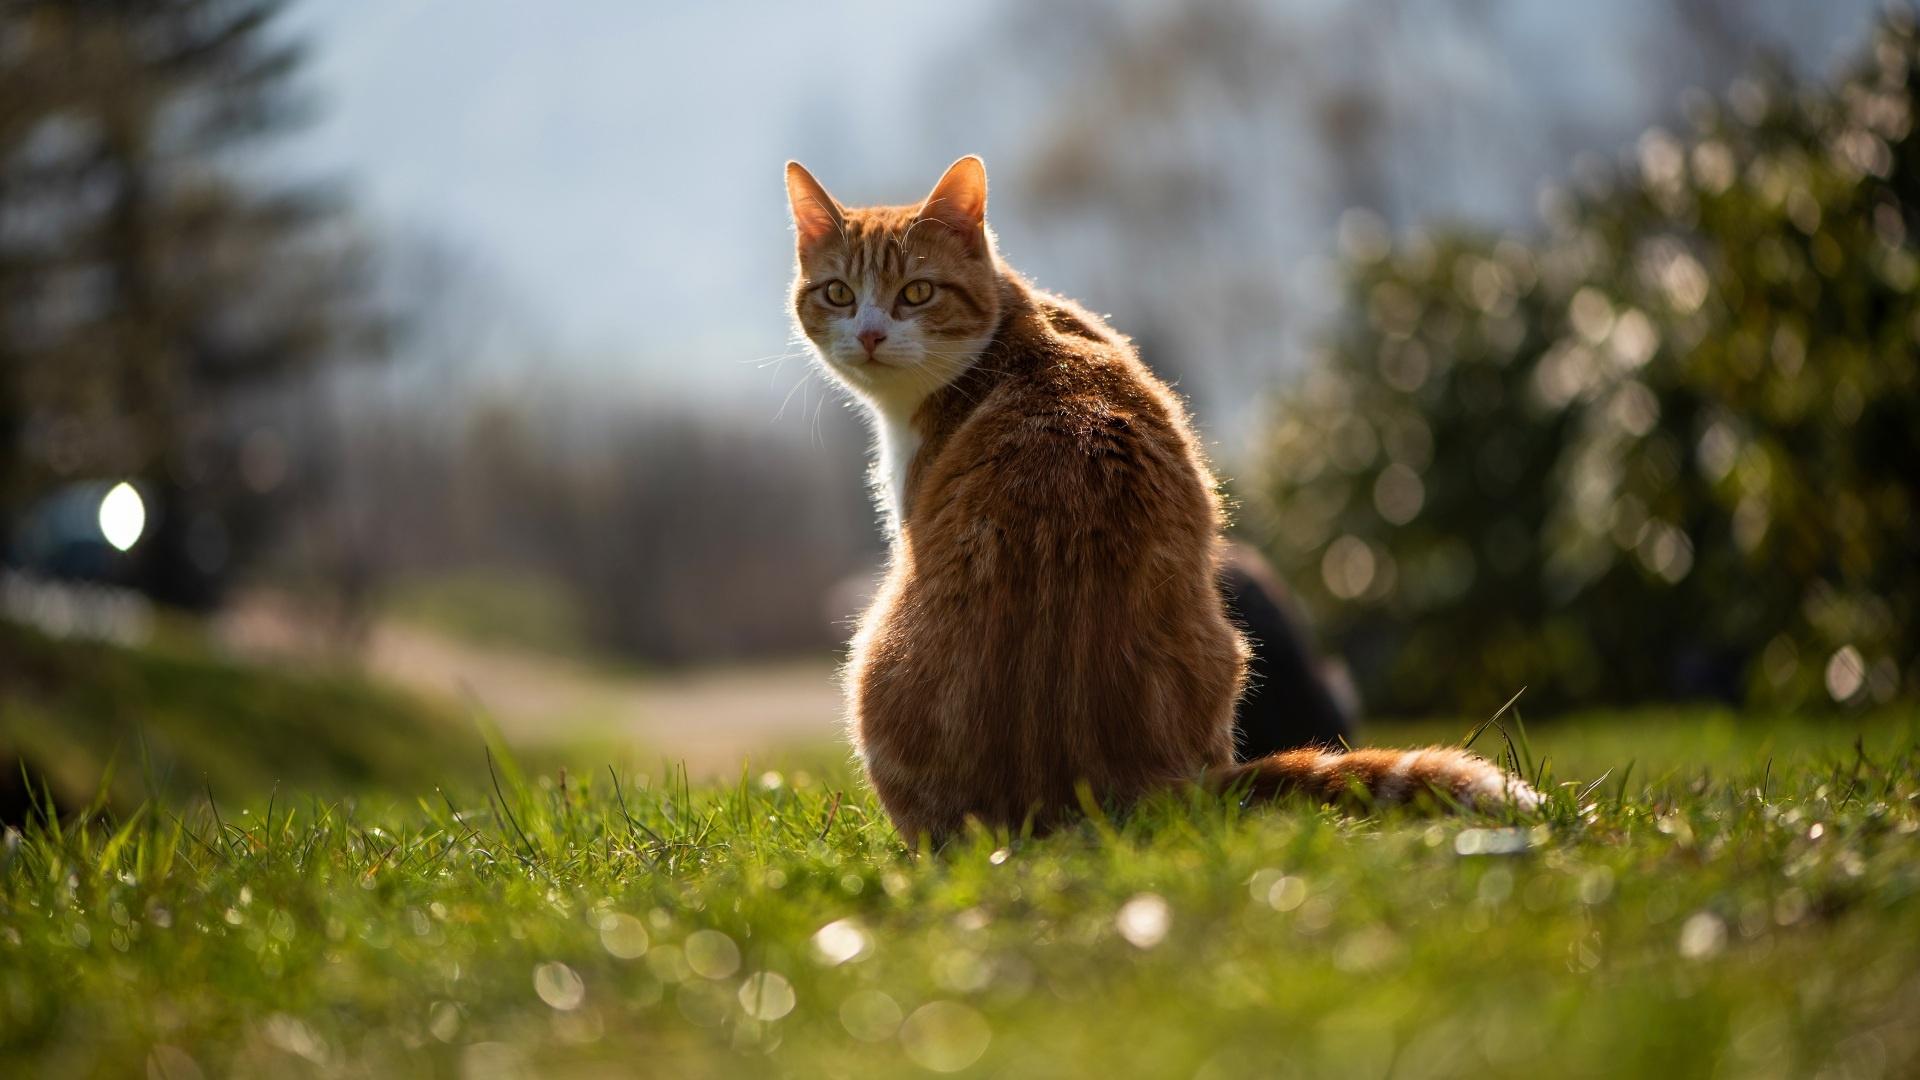 Cat 1080p wallpaper